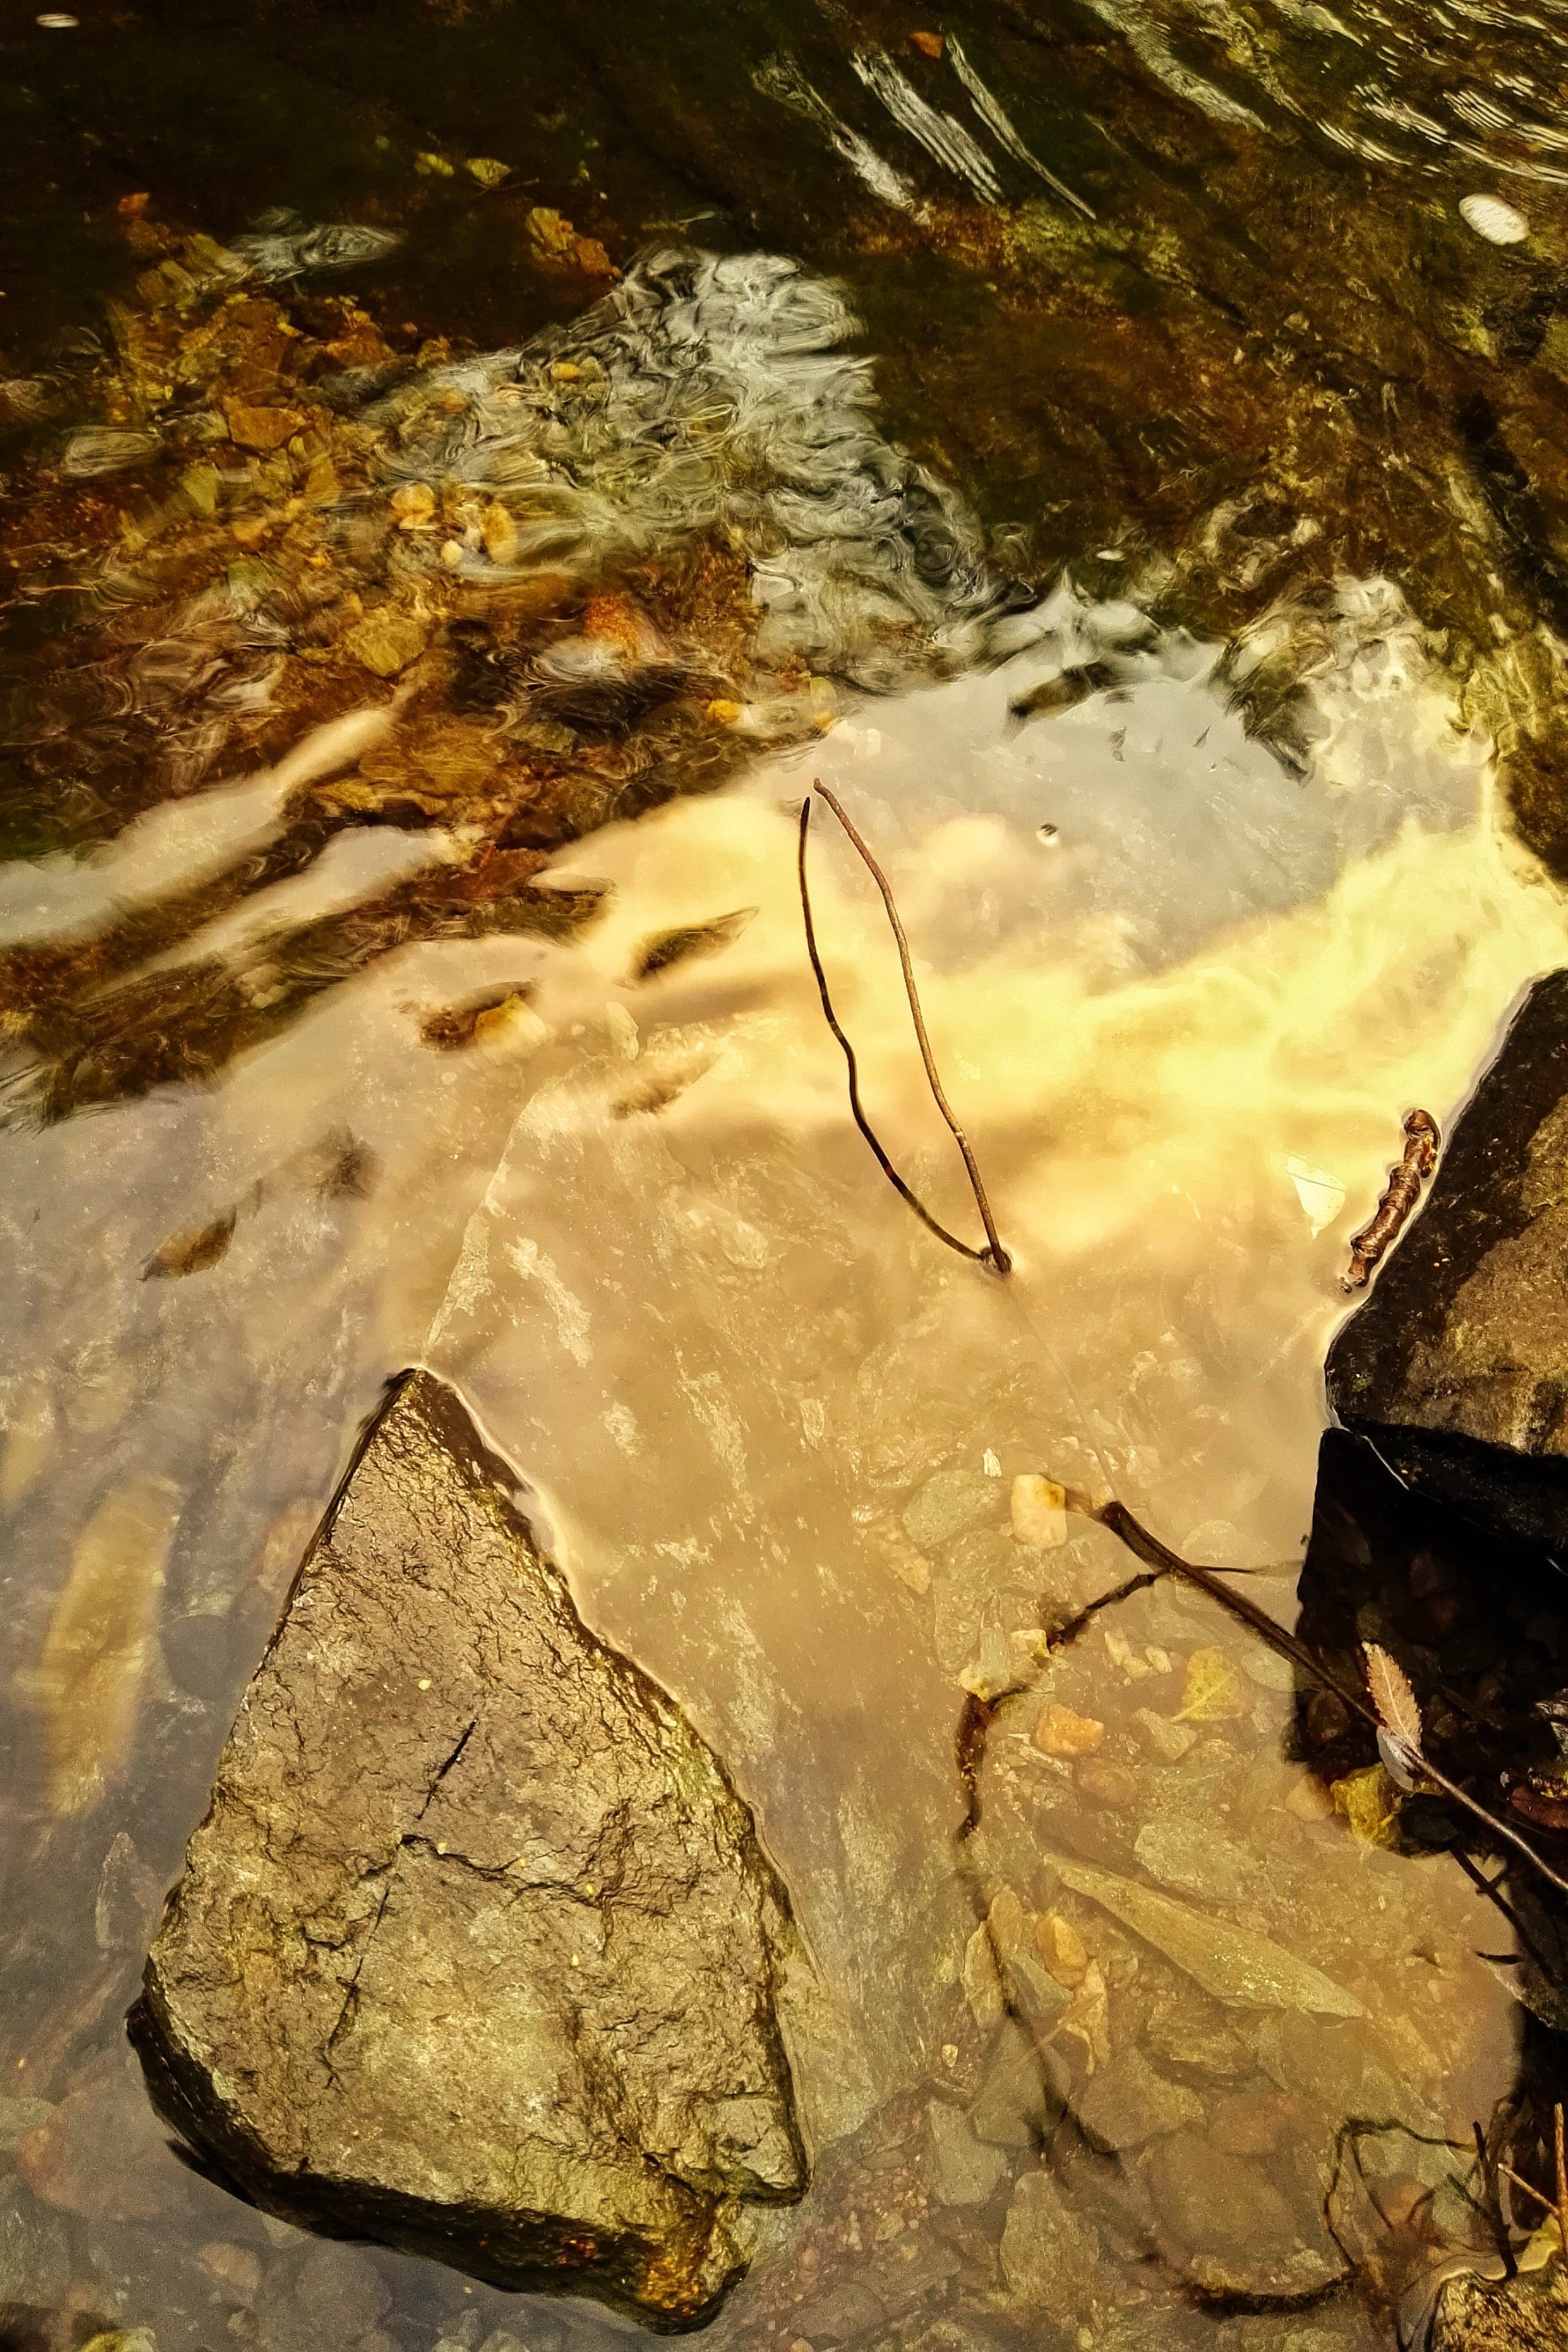 Fargespill i vann